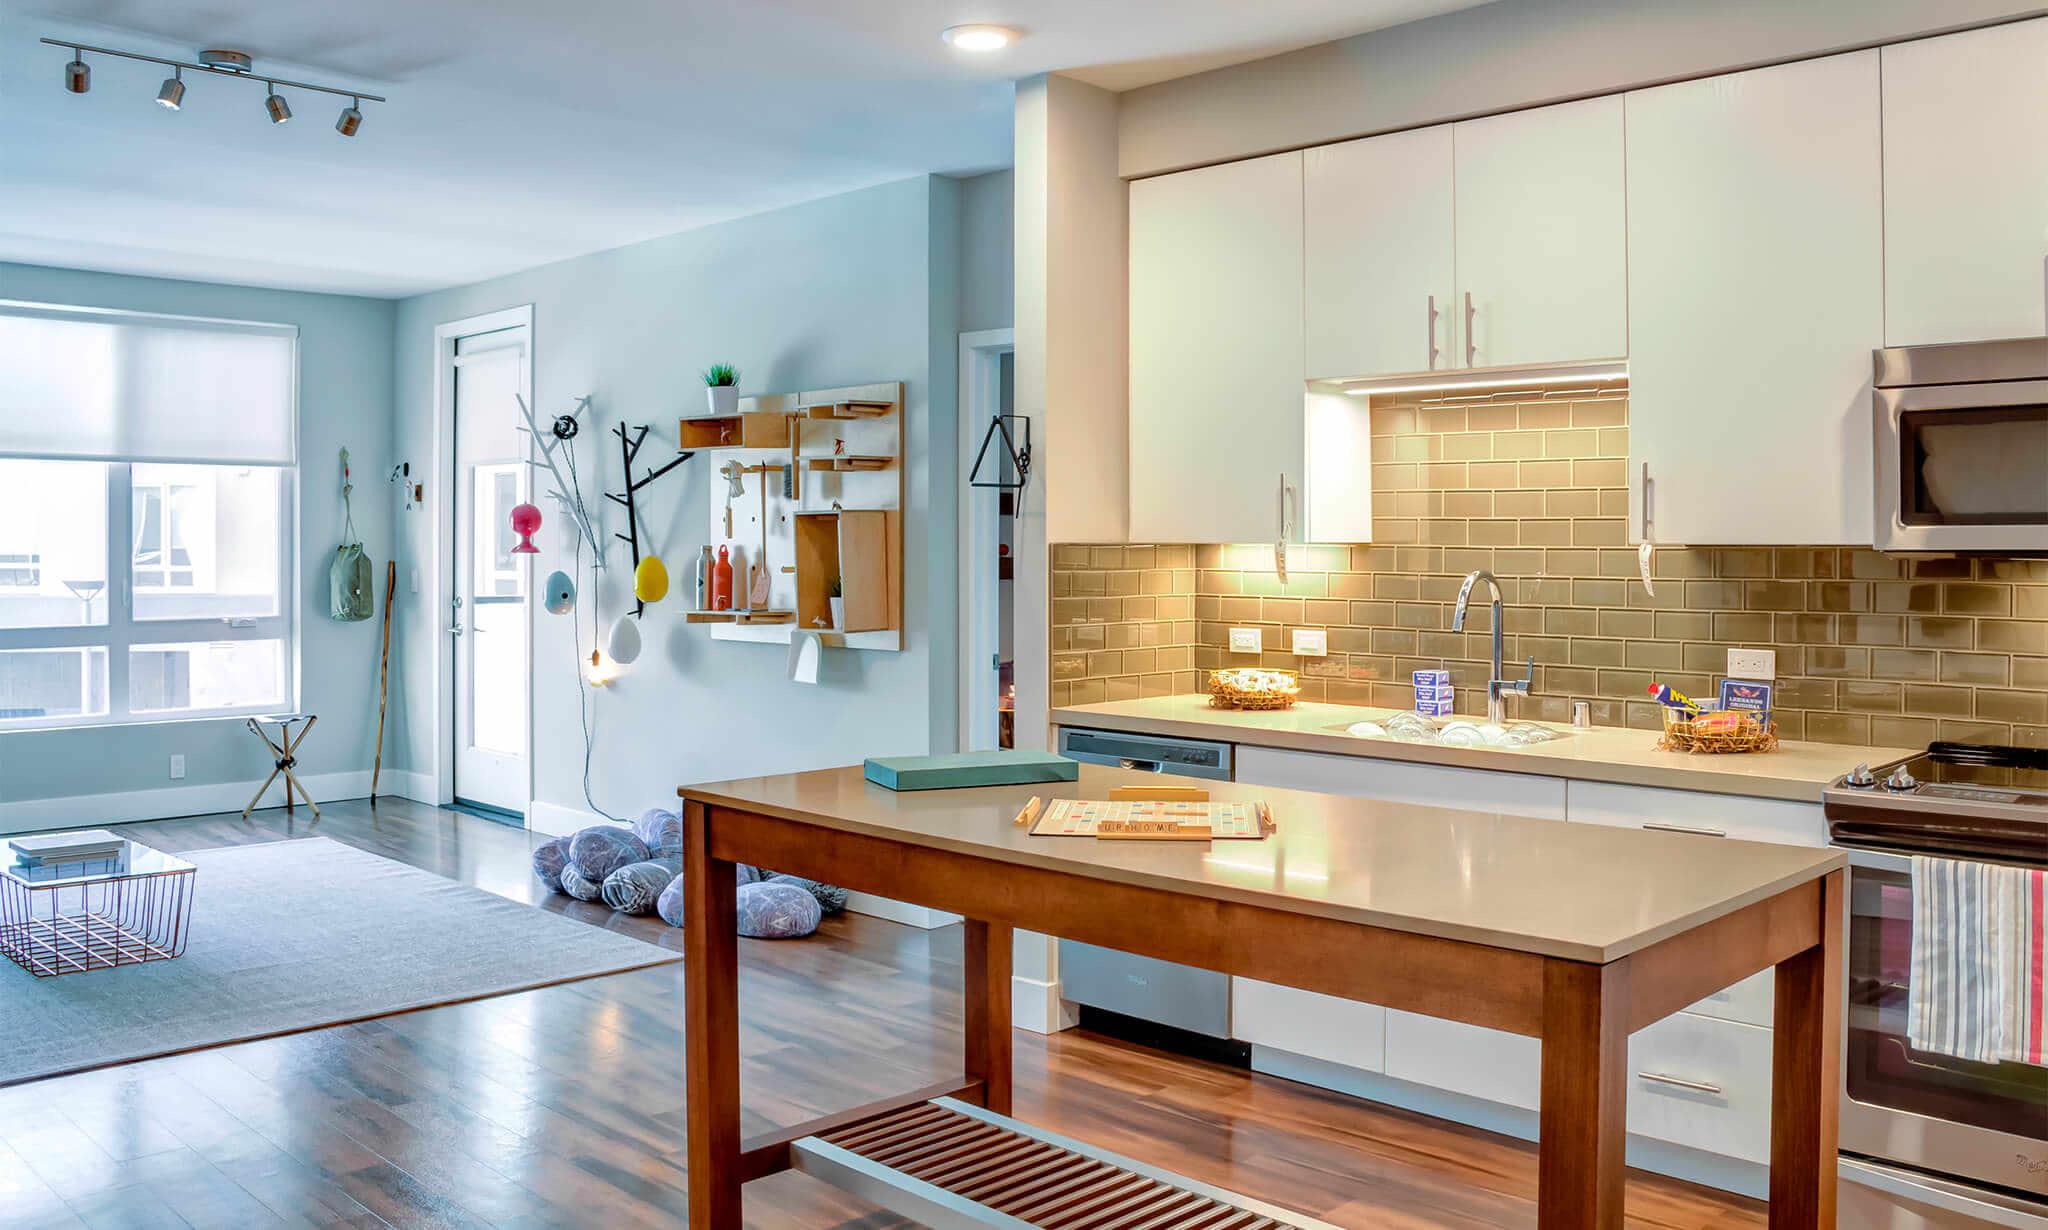 Cobalt Apartments apartments in Santa Clara CA to rent photo 13